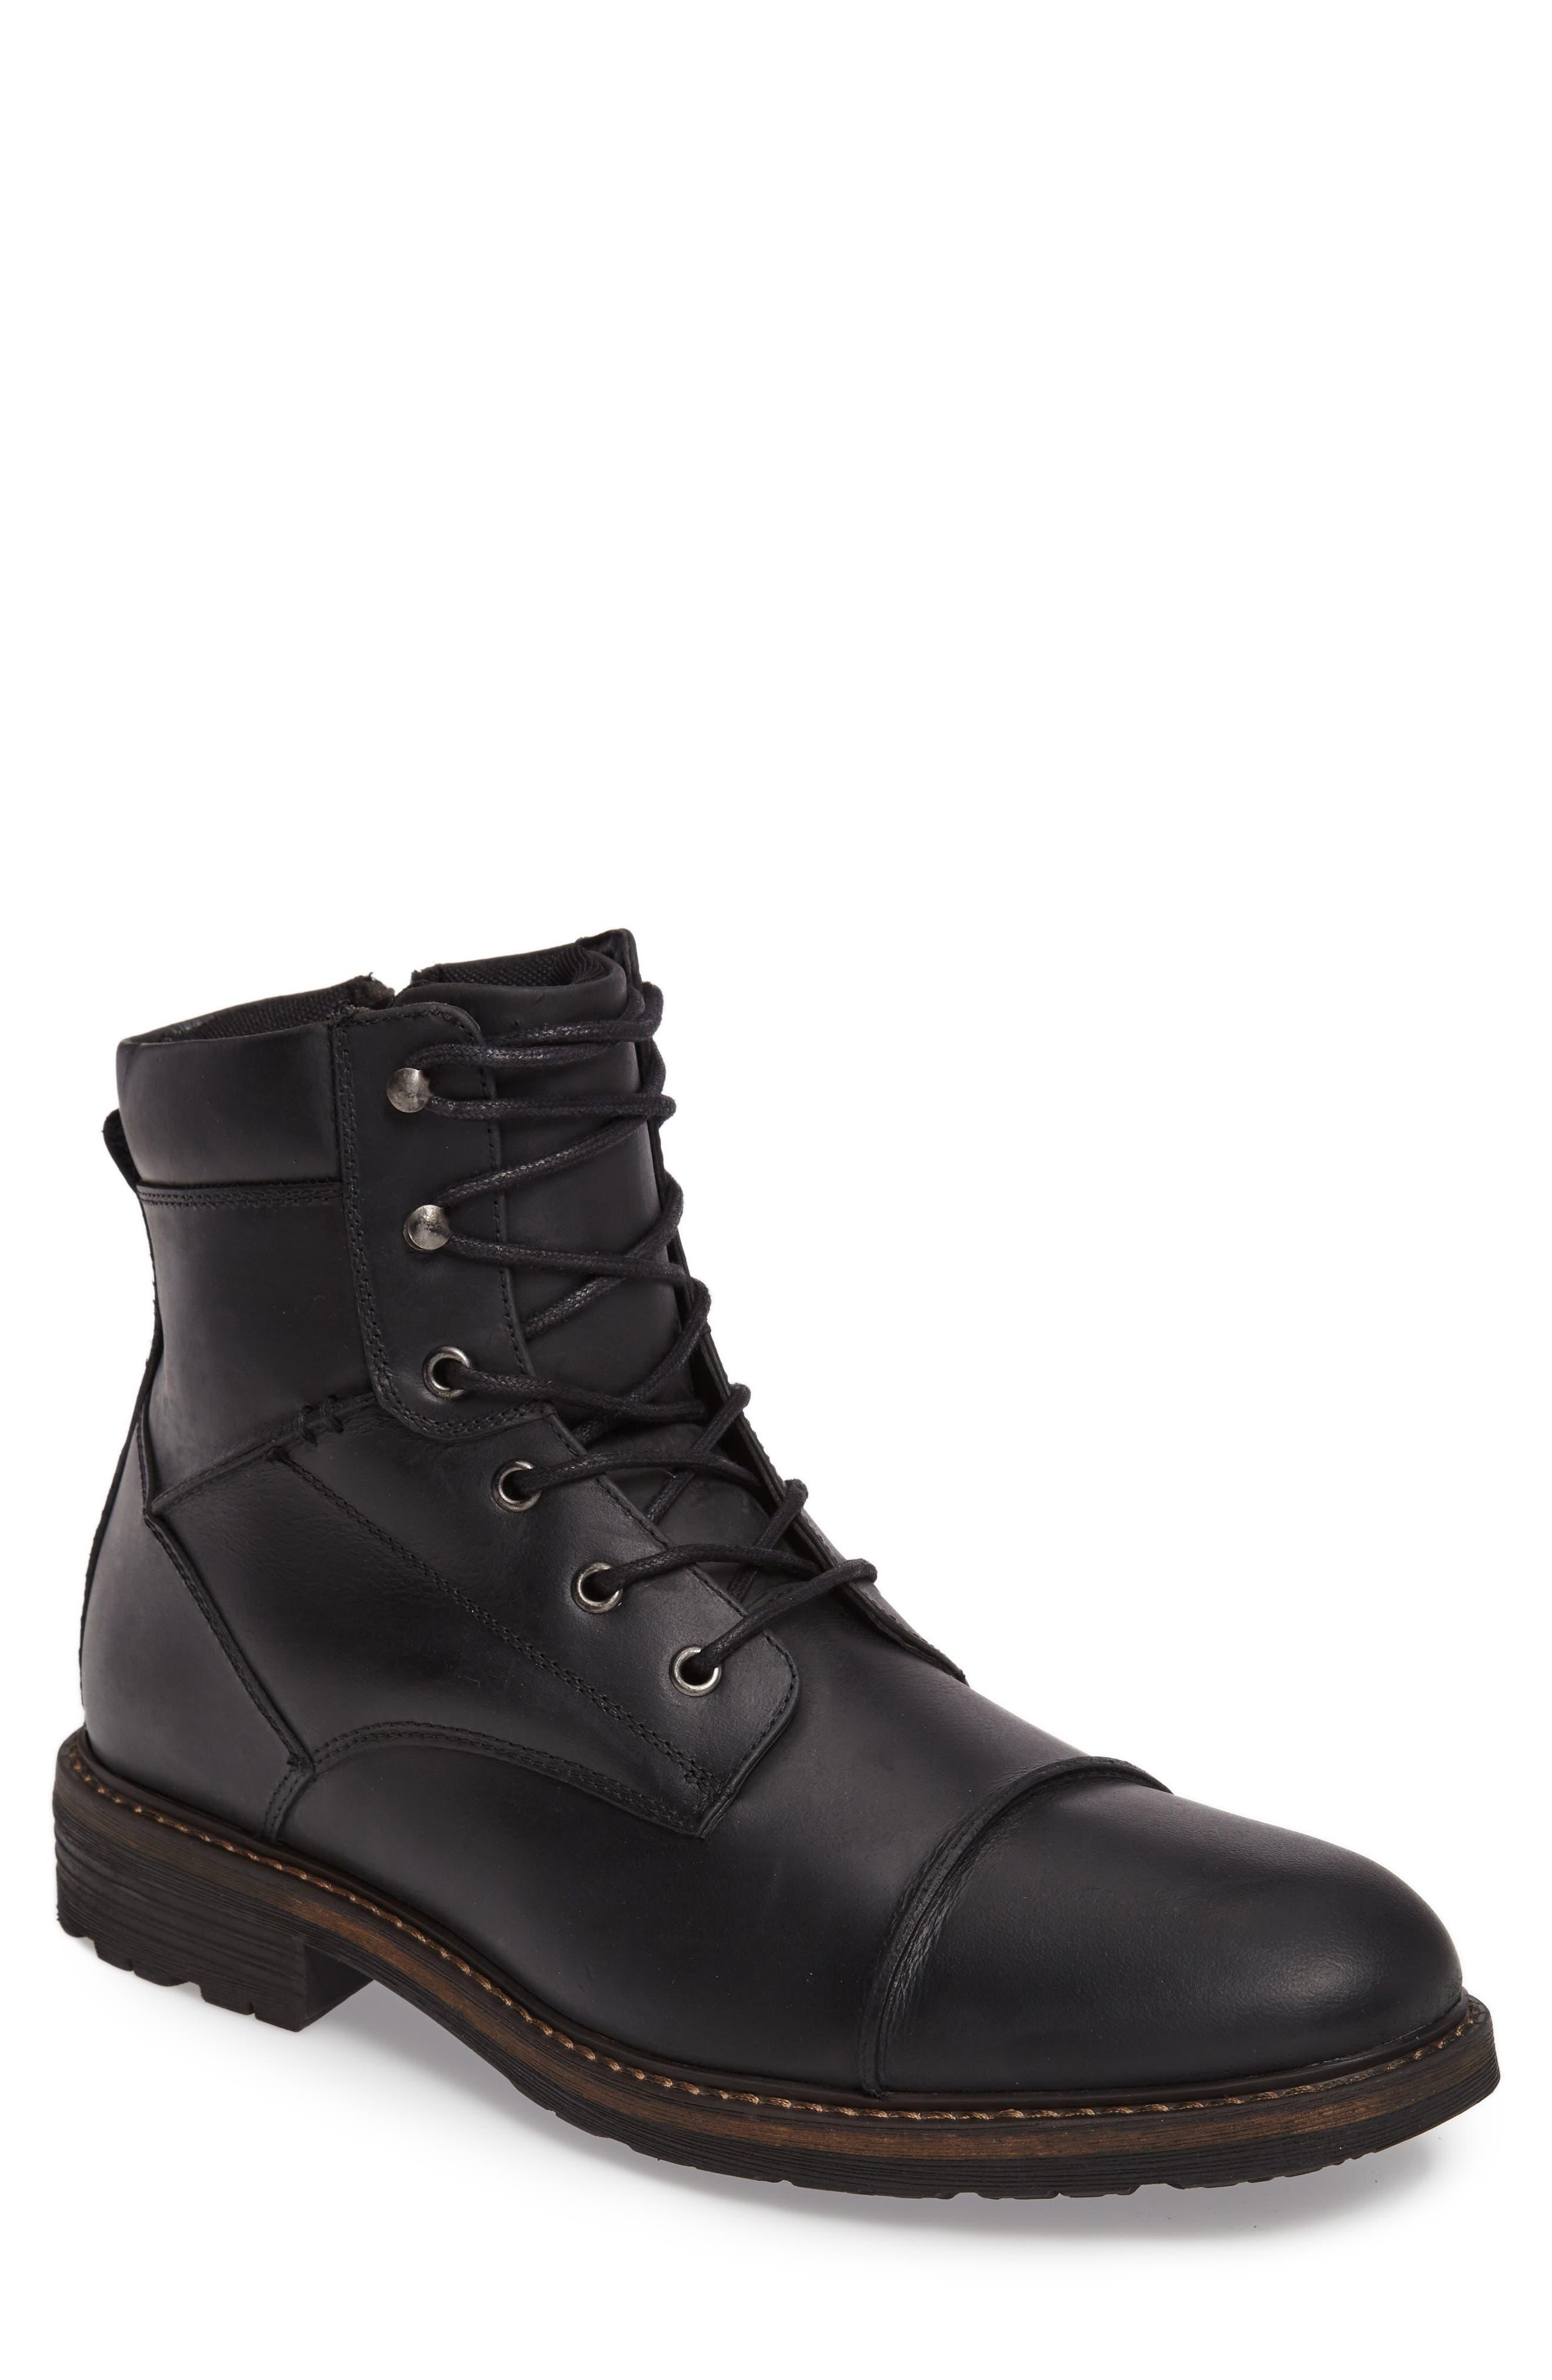 Derek Cap Toe Boot,                         Main,                         color, BLACK LEATHER